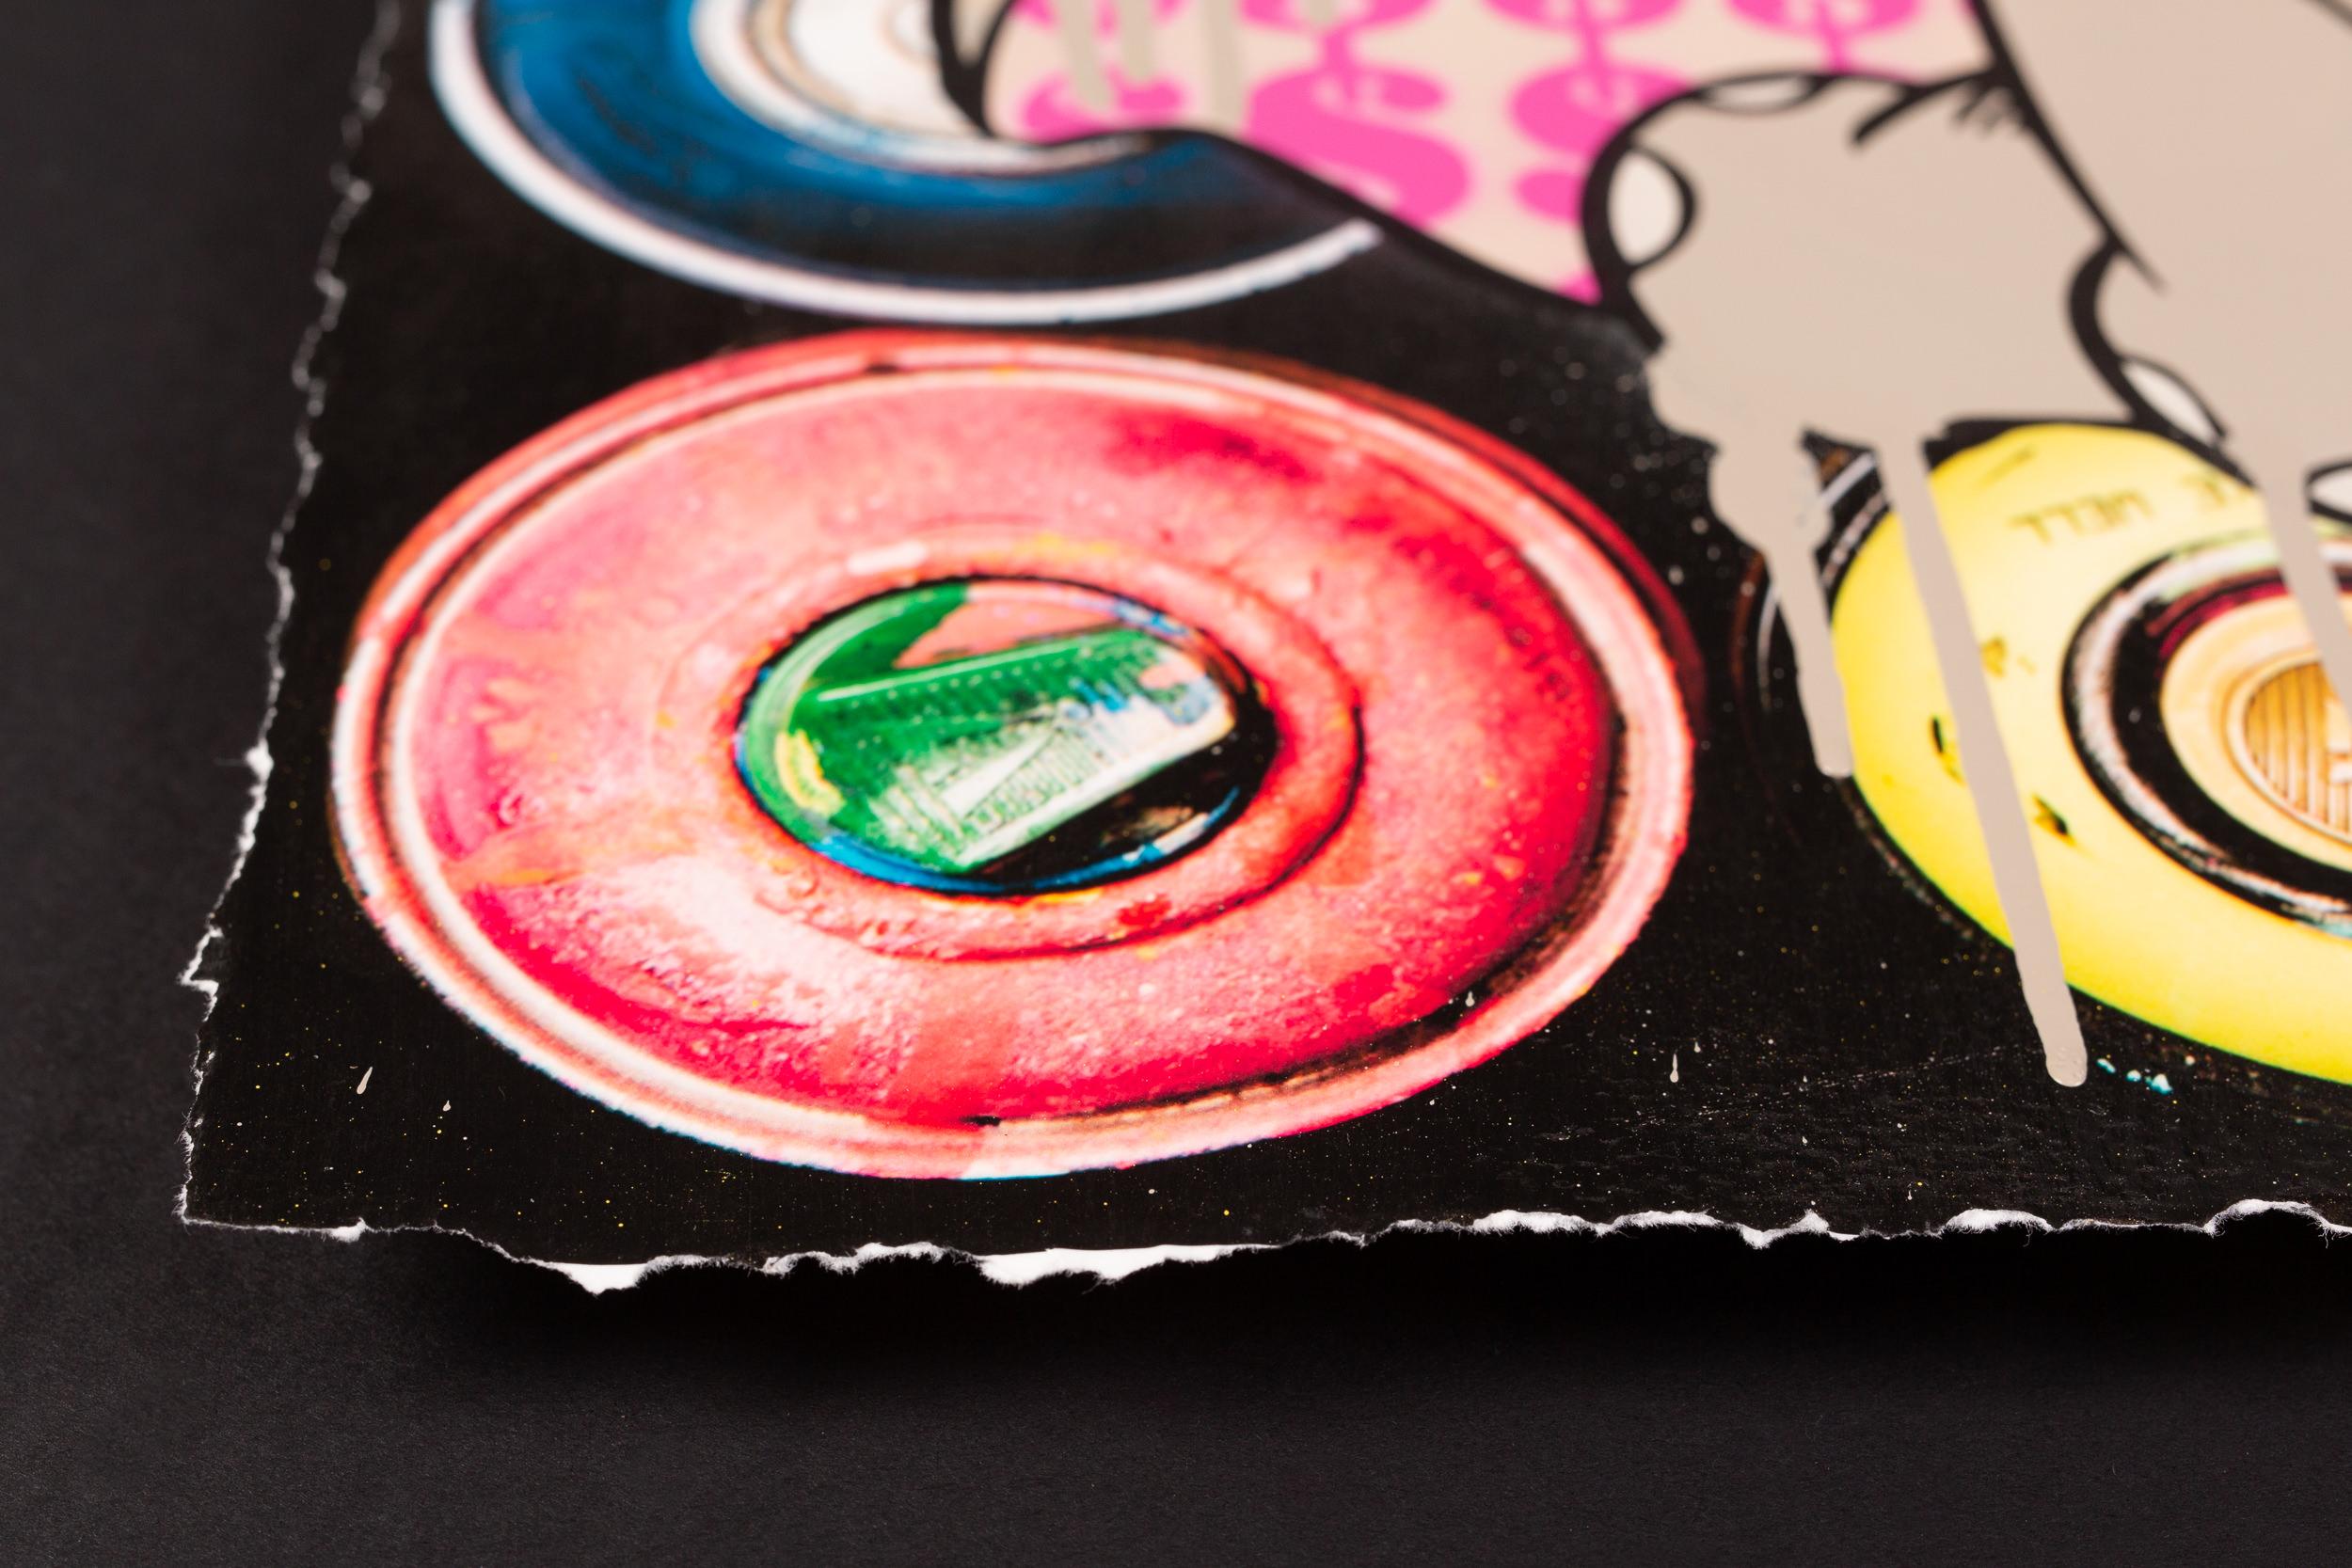 Popaganda-Cans-Dumbo-Detail-05.jpg